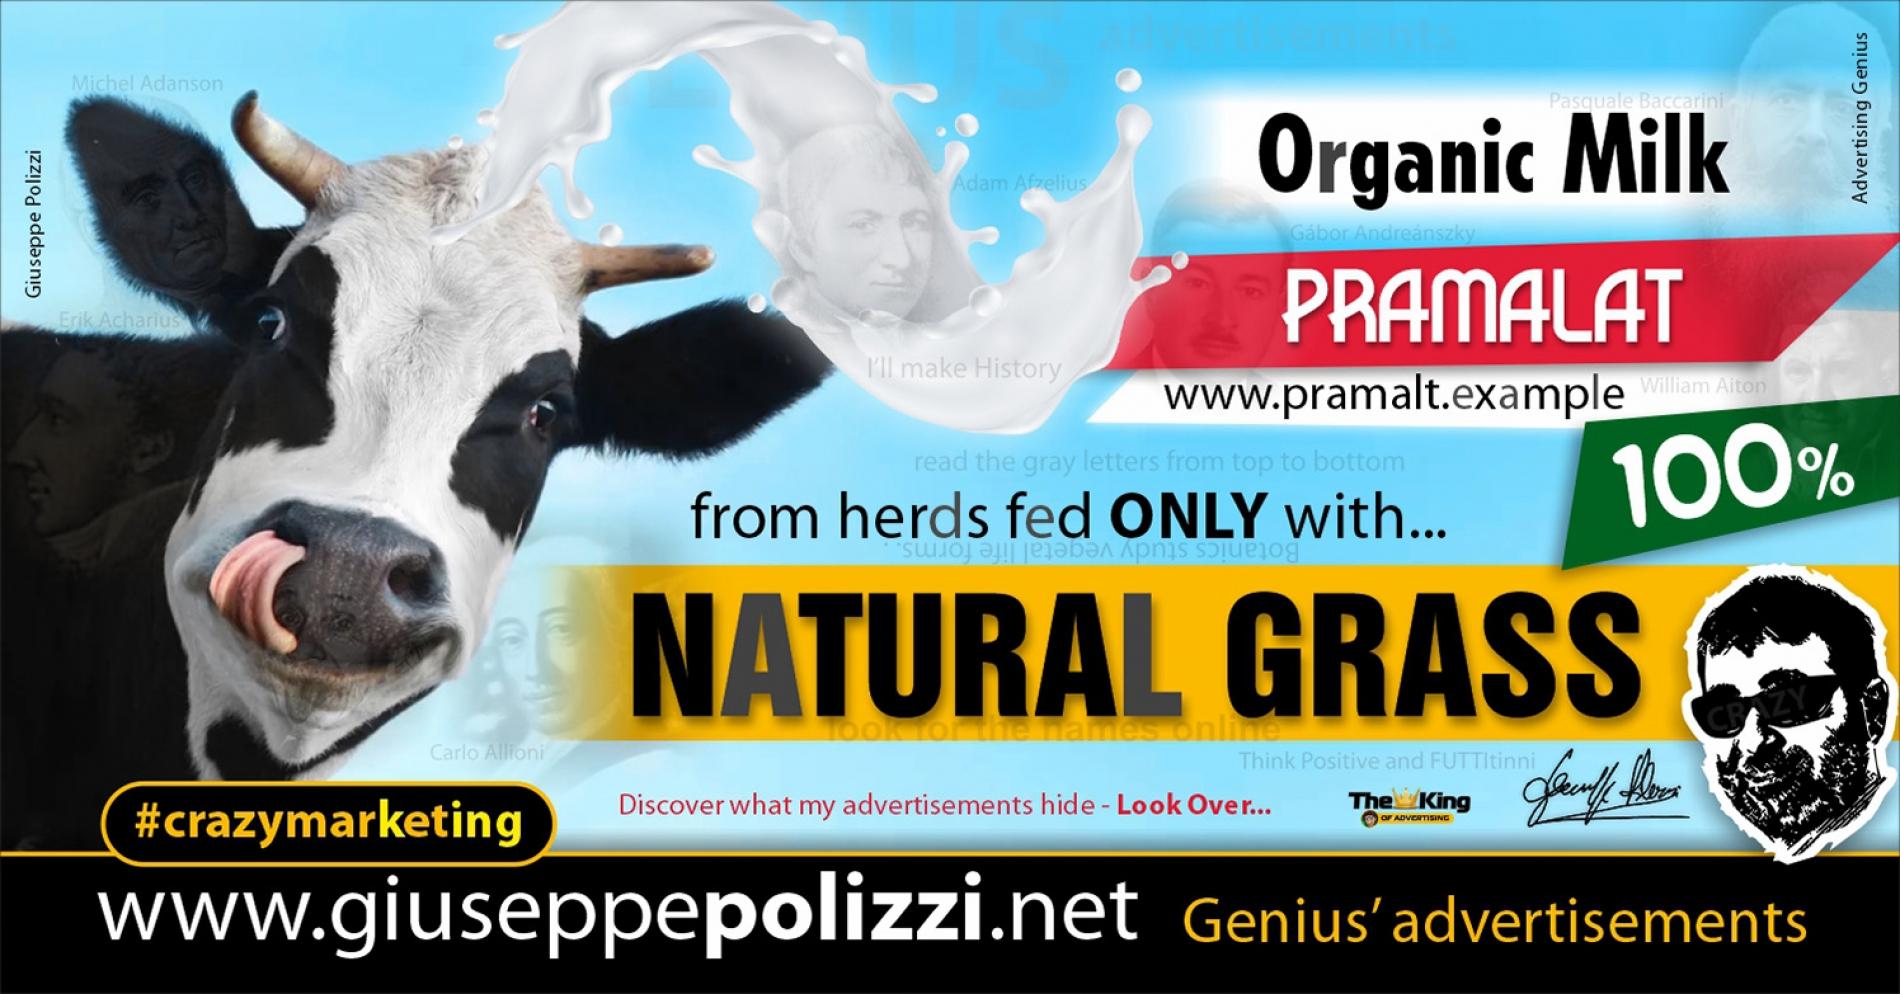 giuseppe polizzi Advertising NATURAL GRASS Crazy Marketing  2021